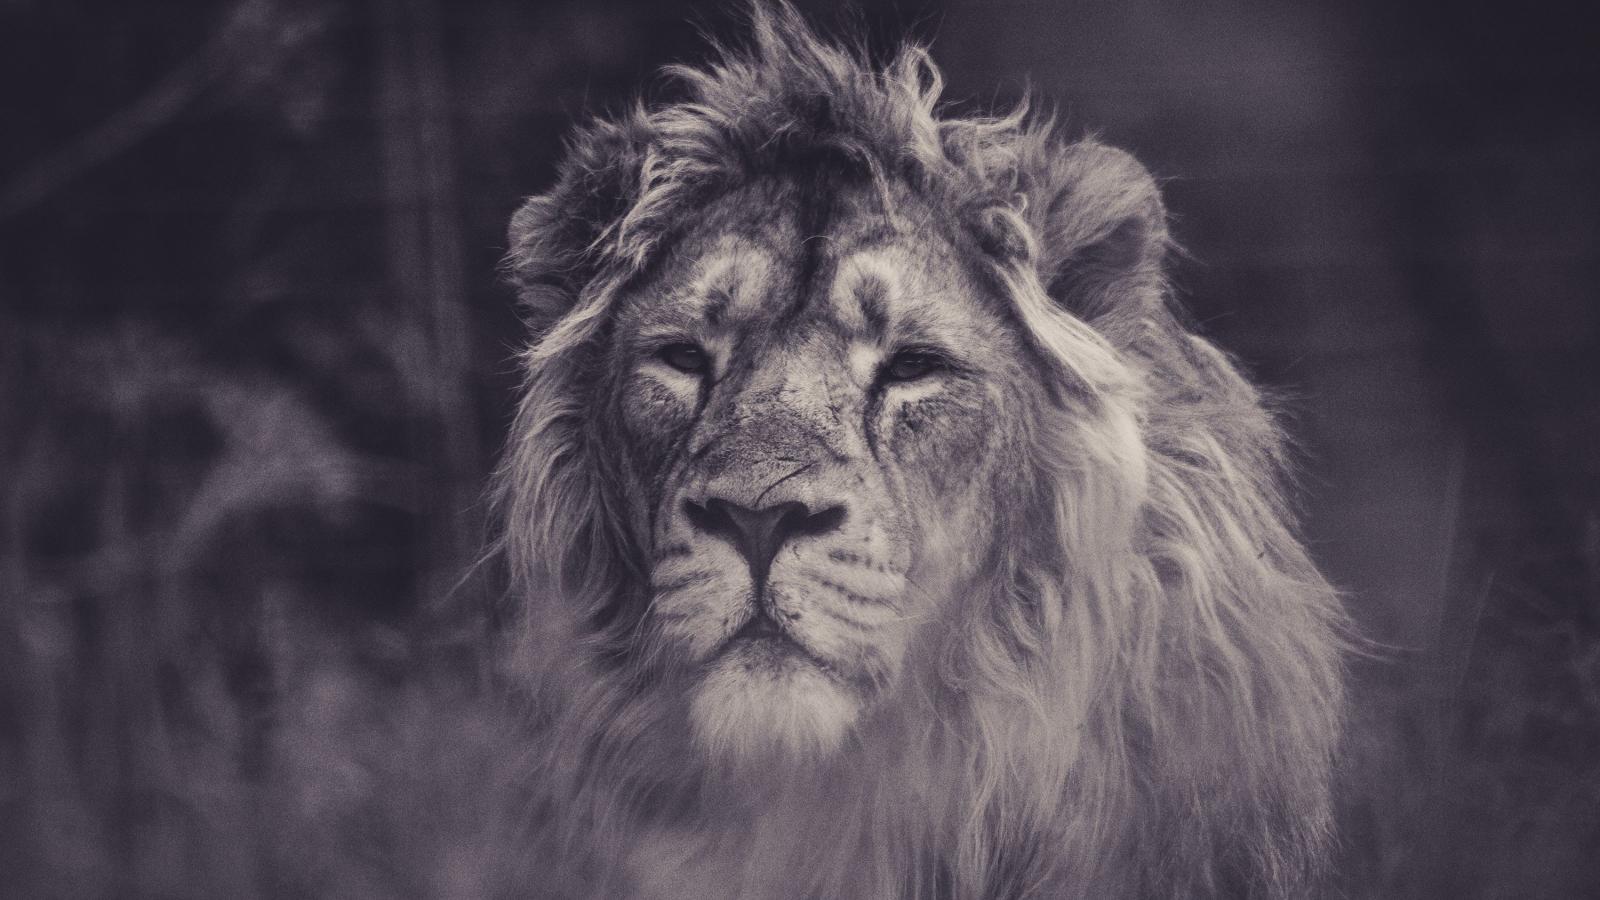 Lion, calm, predator, muzzle, 1600x900 wallpaper